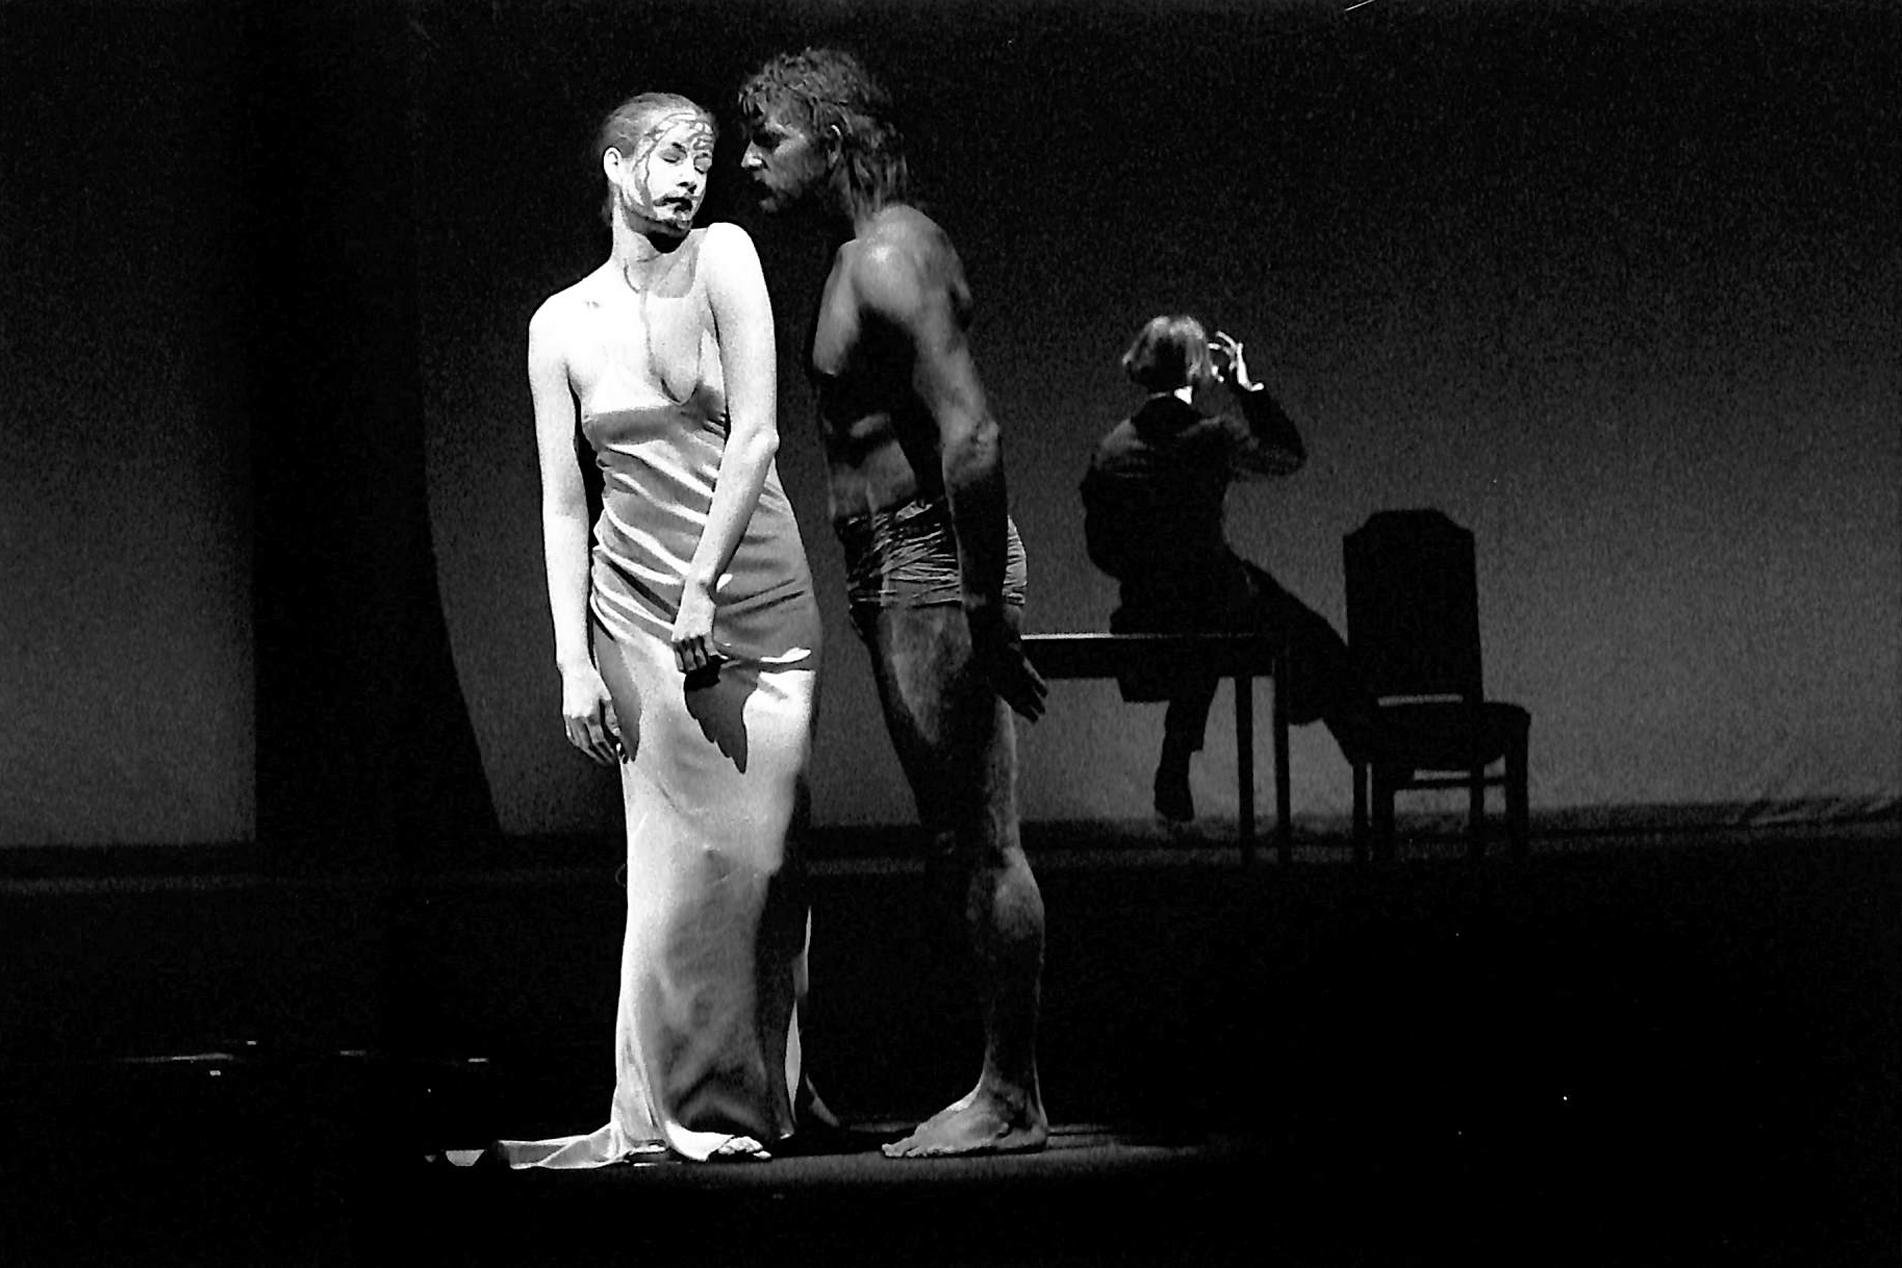 Act IV, Scene 3 - Geno Lechner (Whore), Howie Seago (Enkidu), Martin Wuttke (Gilgamesh)